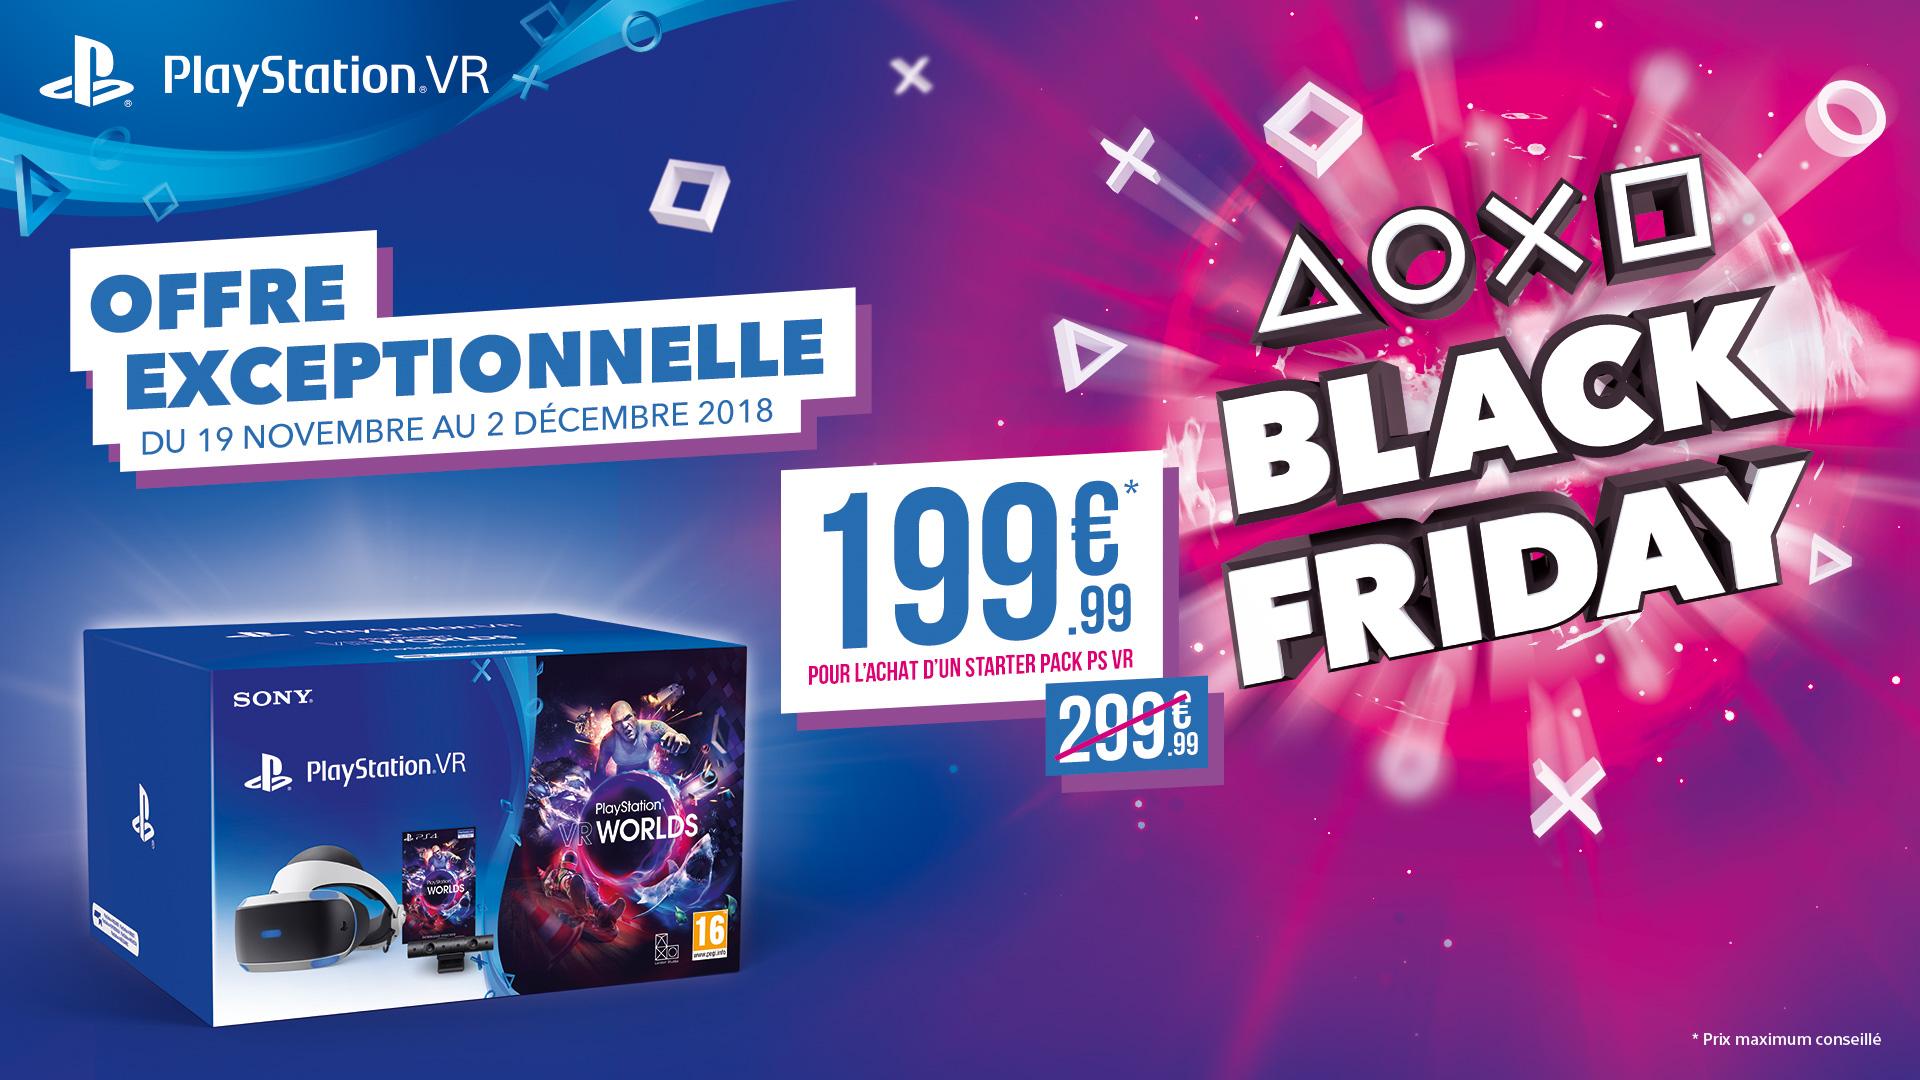 PlayStation-VR-Black-Friday-2018 Black Friday 2018 - Les offres Playstation